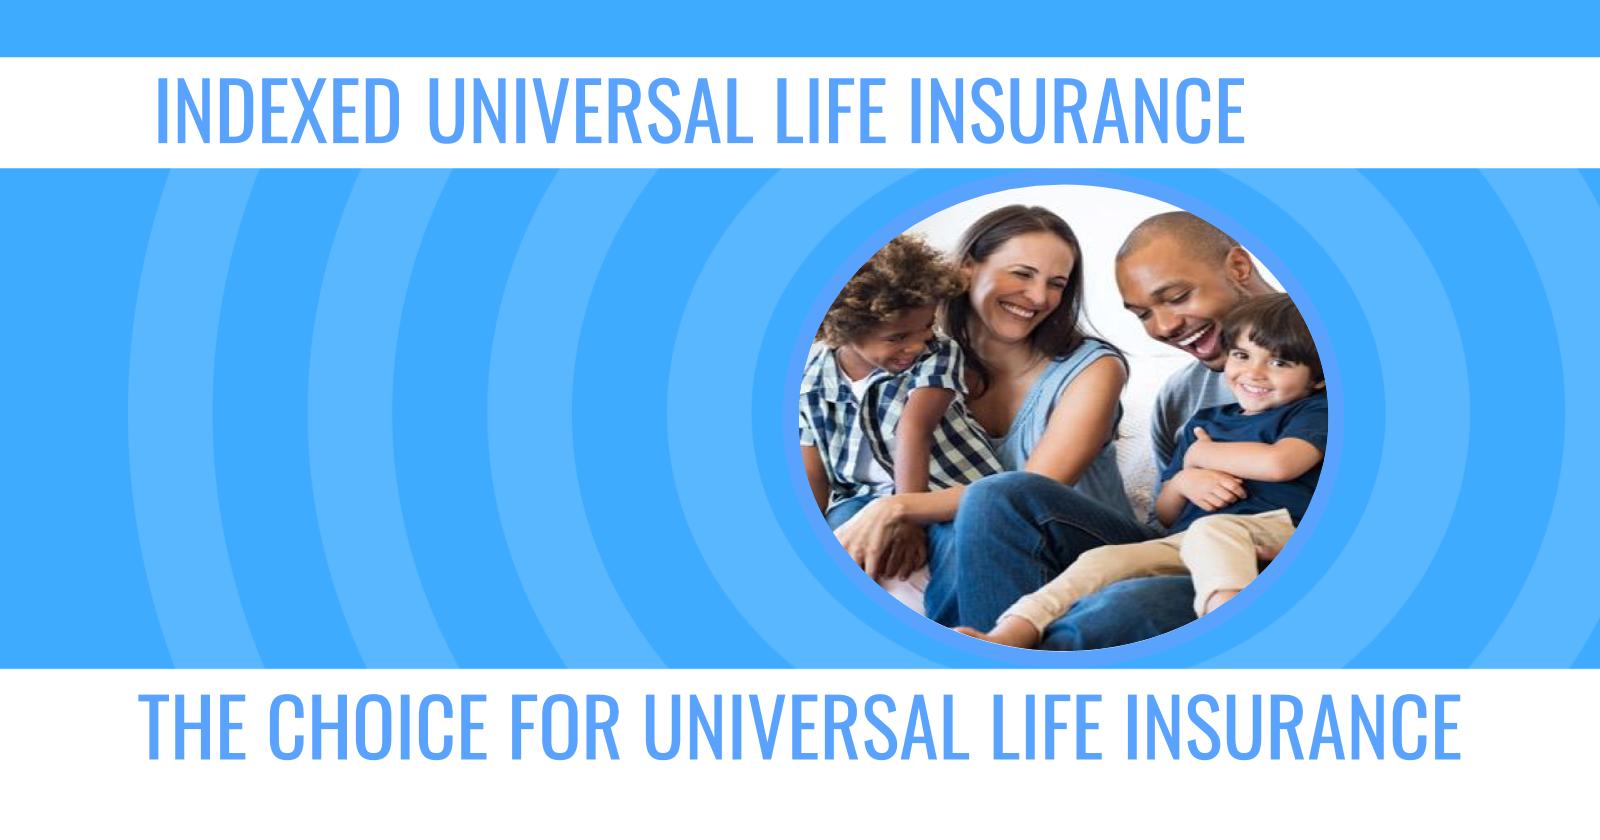 James Hewitt Insurance image 4